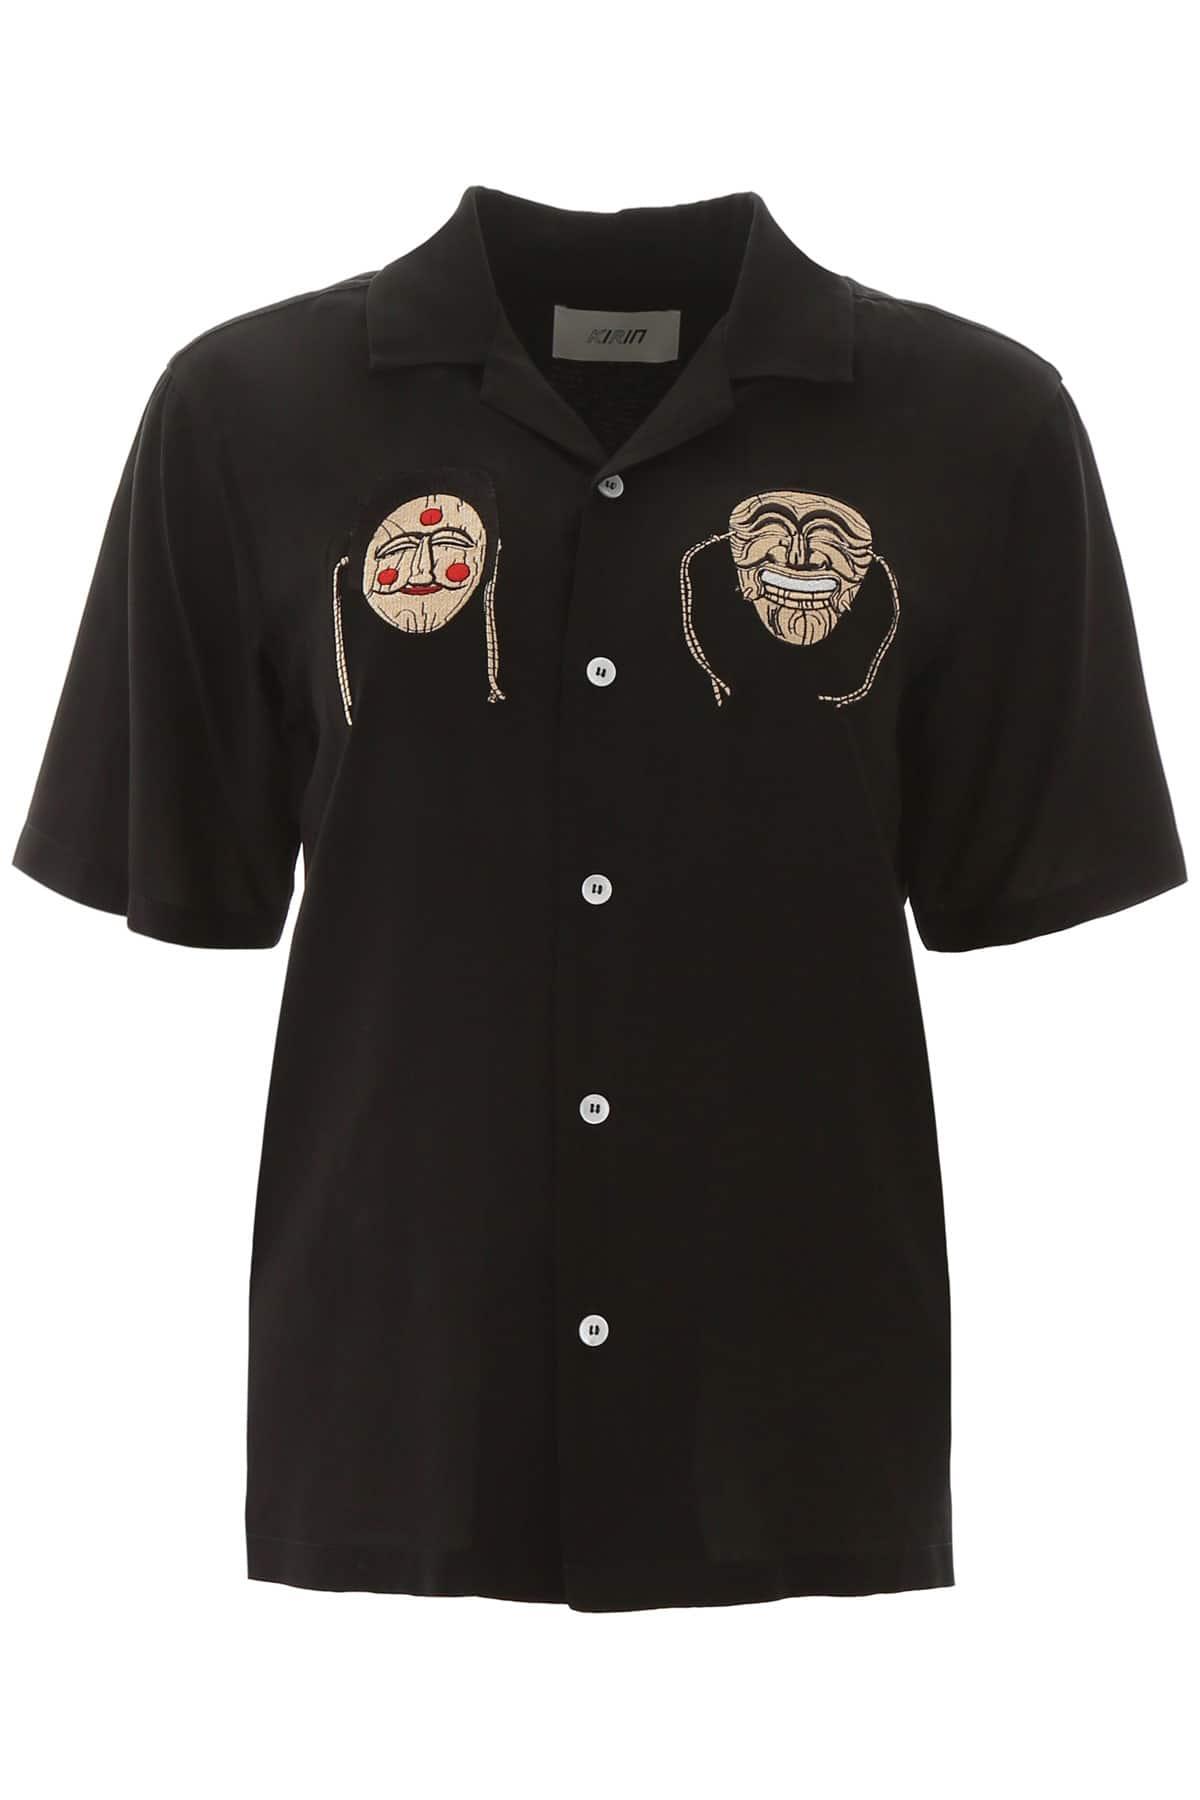 KIRIN MASK EMBROIDERY SHIRT 40 Black, Beige